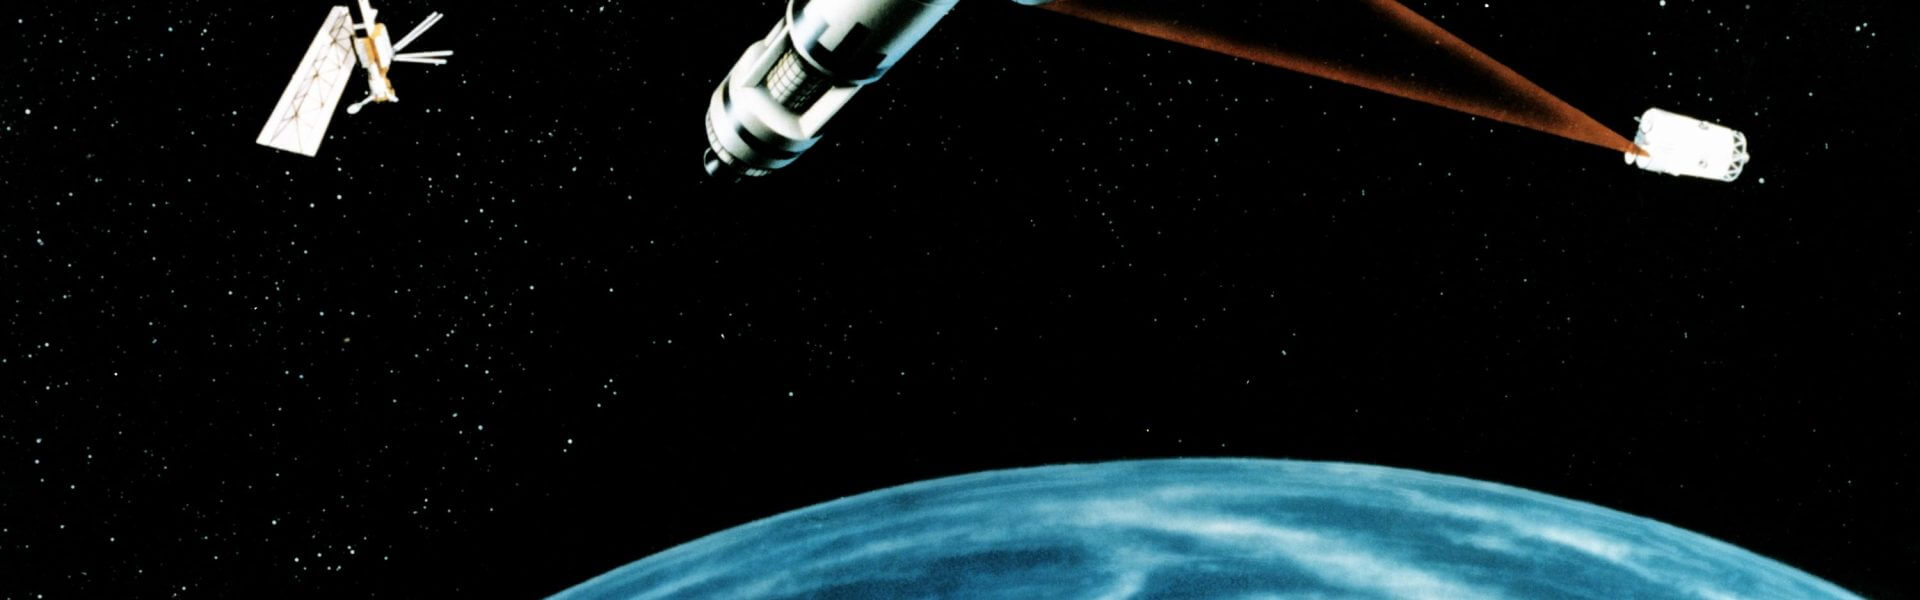 An artist's concept of a Space Laser Satellite Defense System., באדיבות ויקימדיה